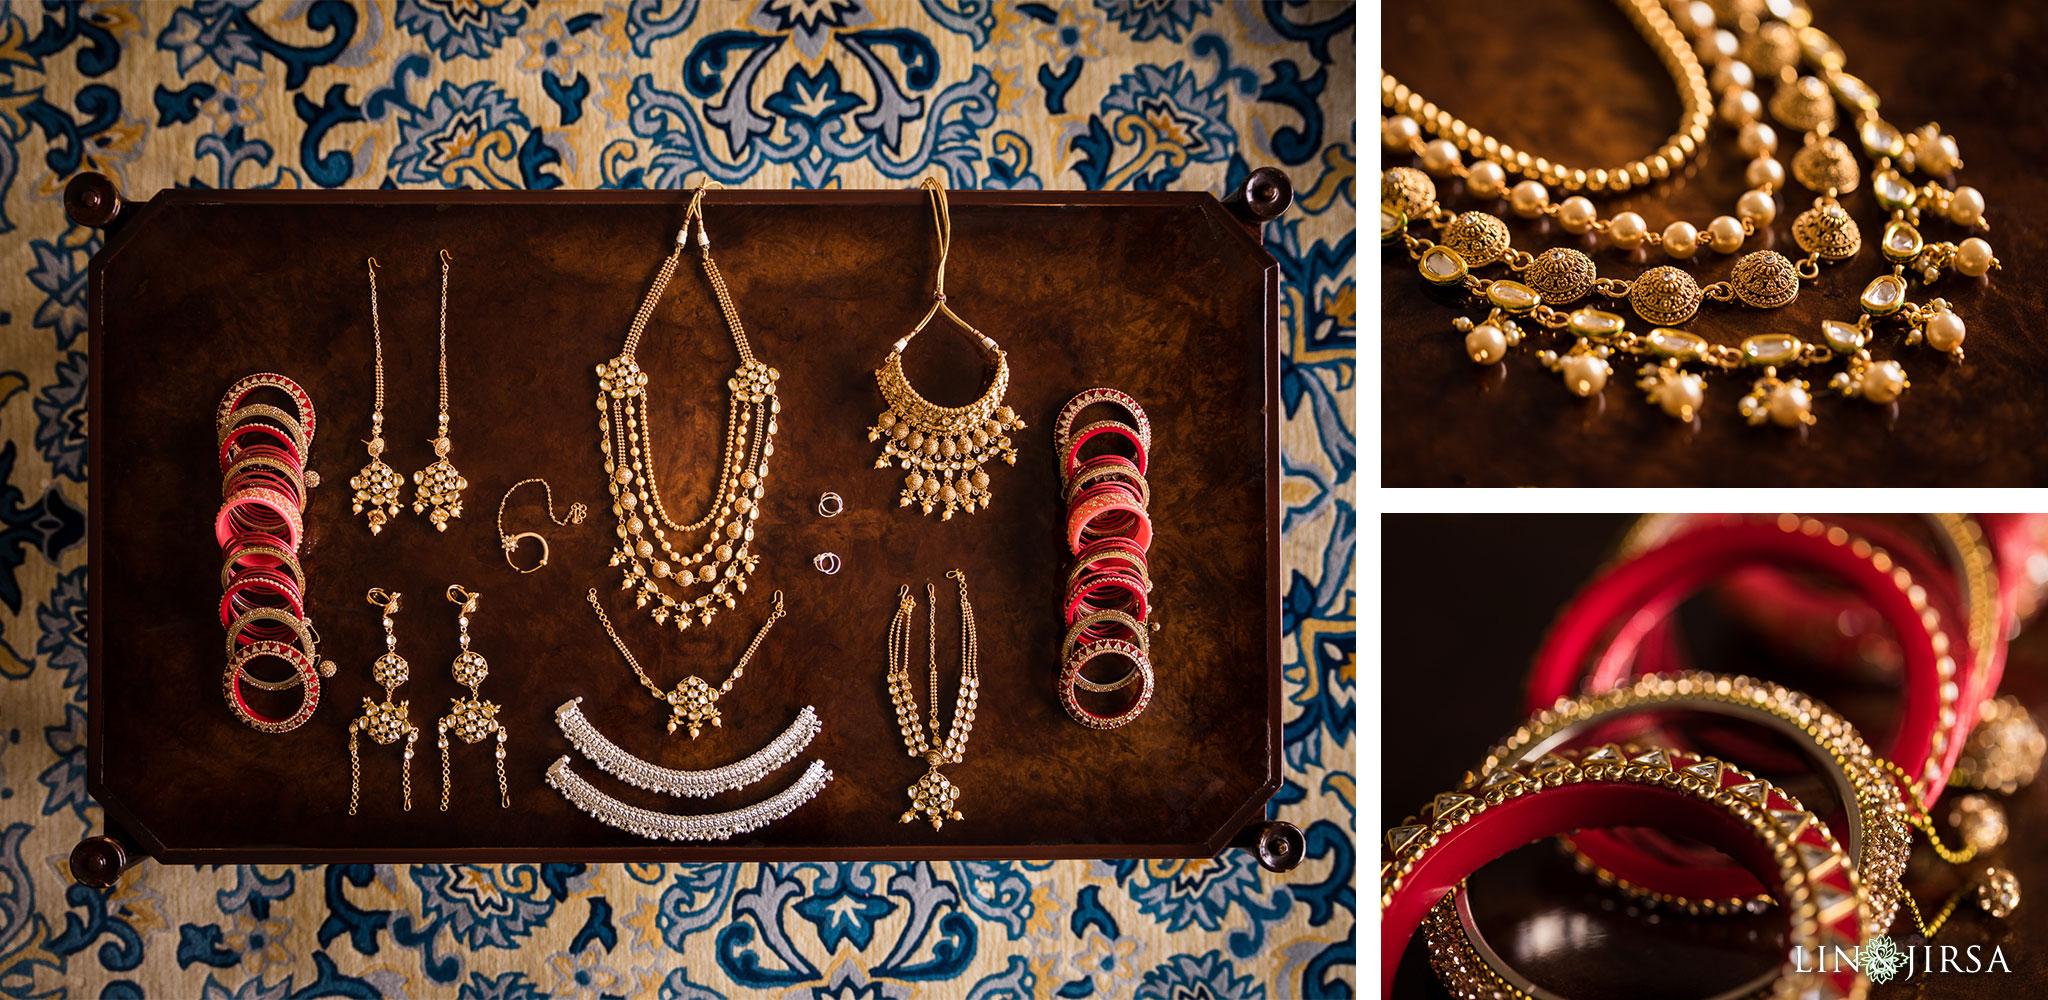 01 four seasons westlake village indian jewelry wedding photography